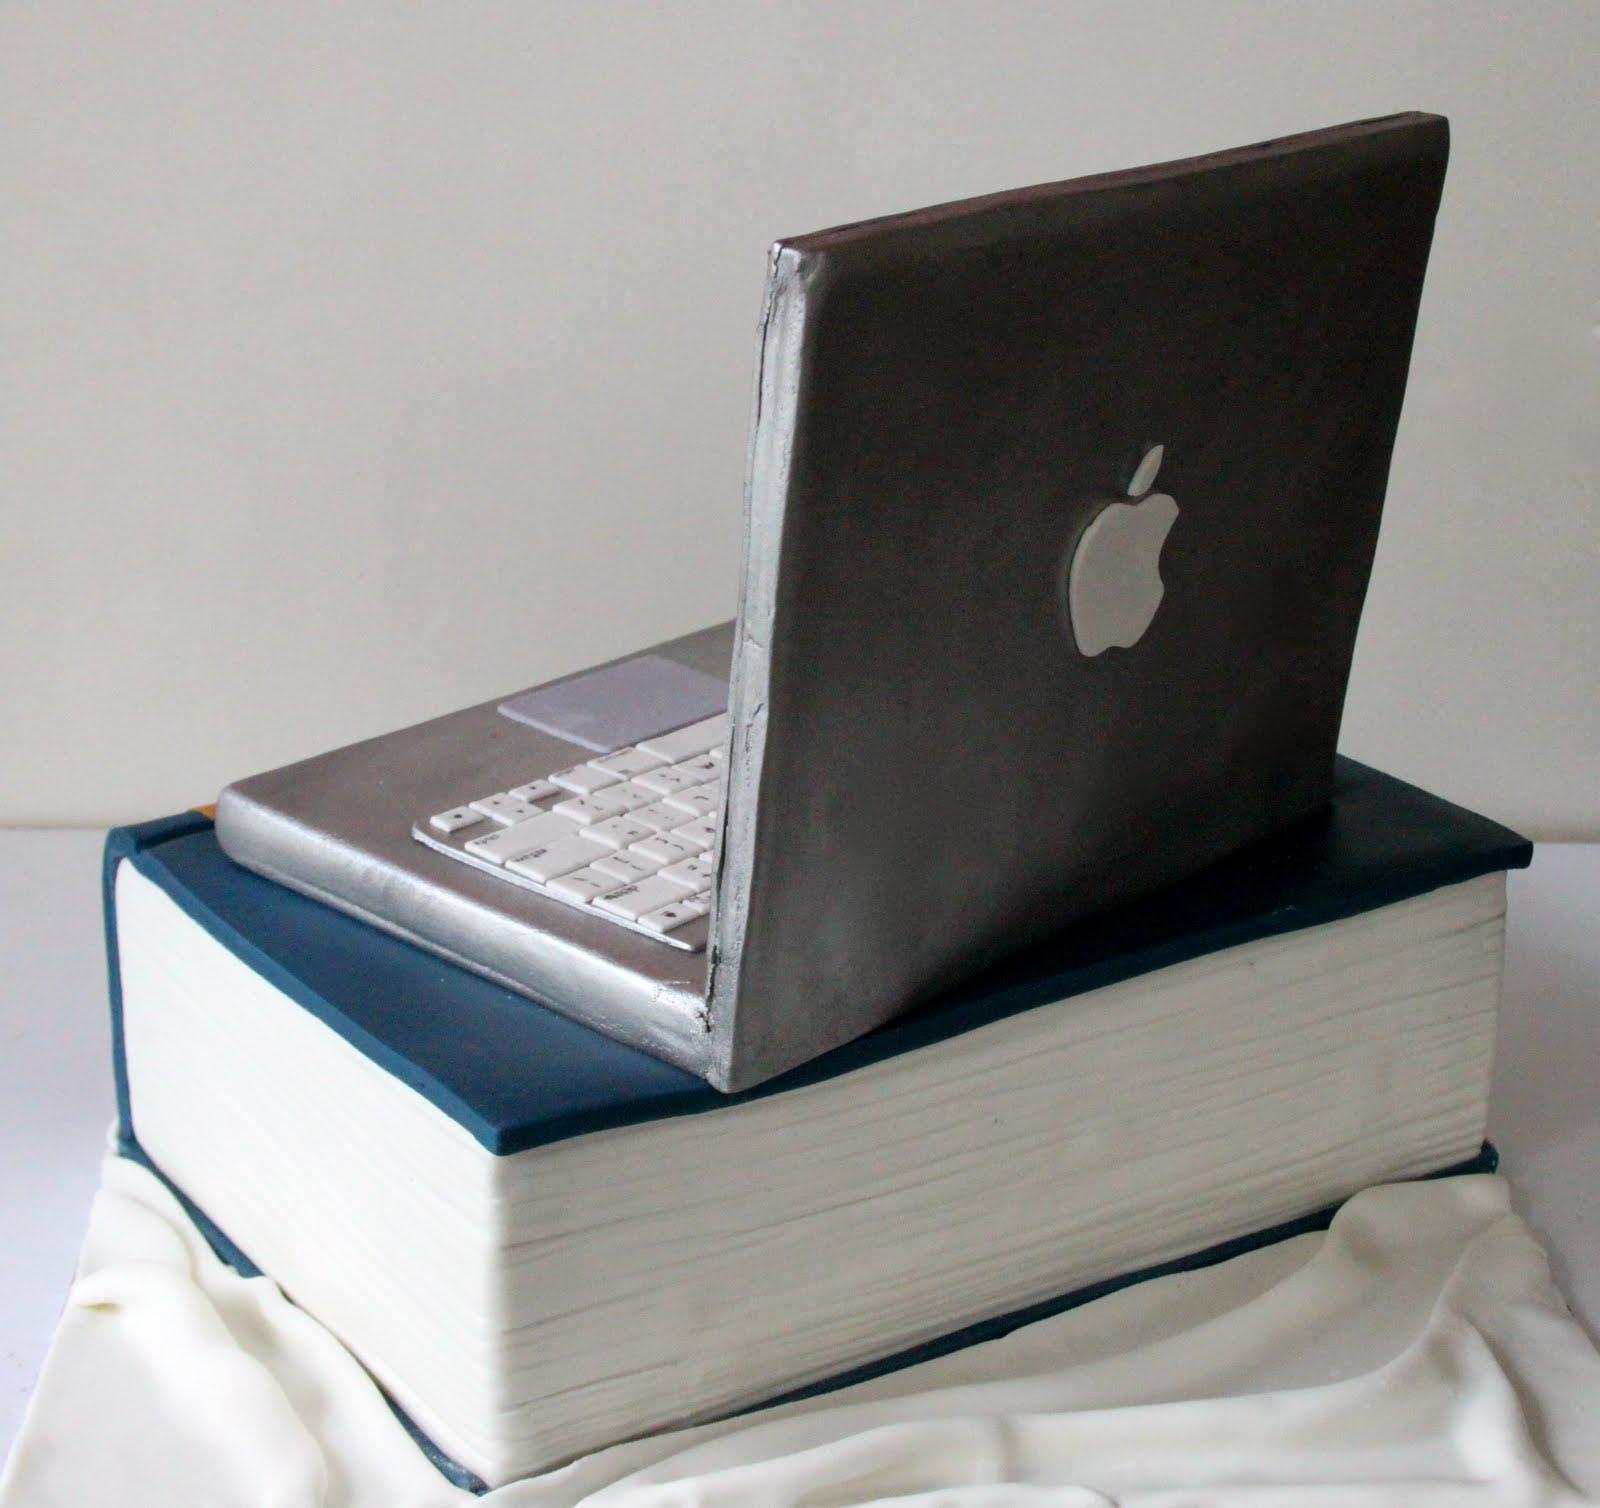 Celebrate with Cake!: MacBook Flight Manual Cake